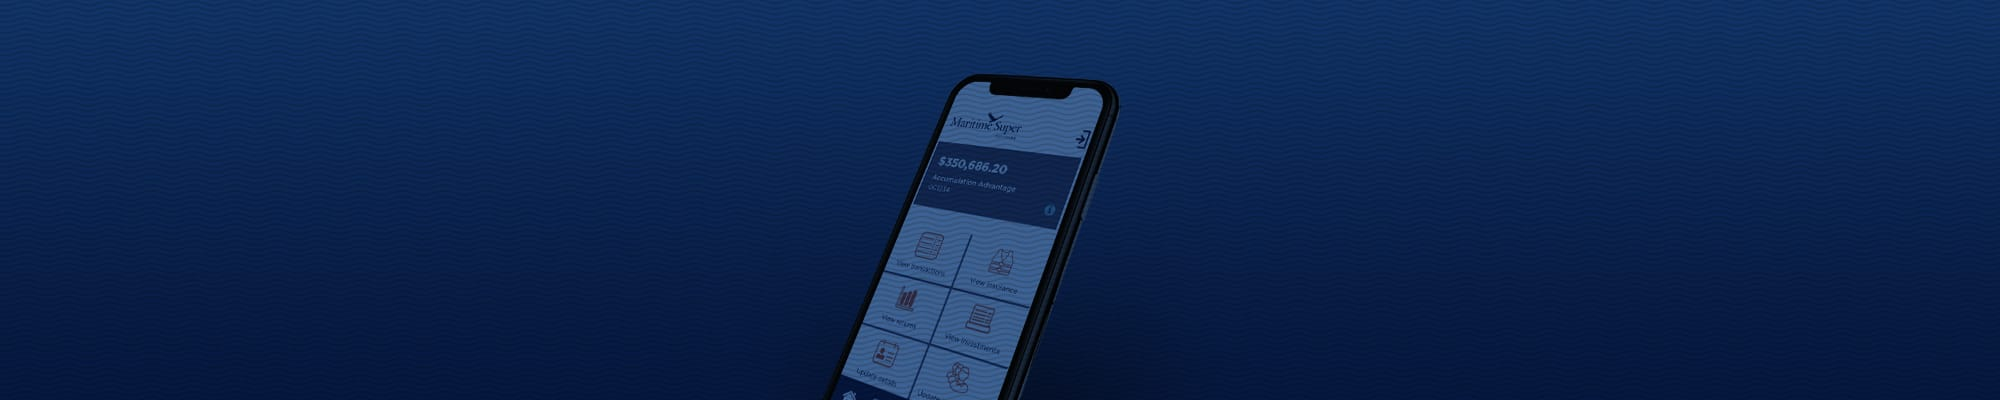 https://www.maritimesuper.com.au/sites/default/files/revslider/image/app-final_1.jpg